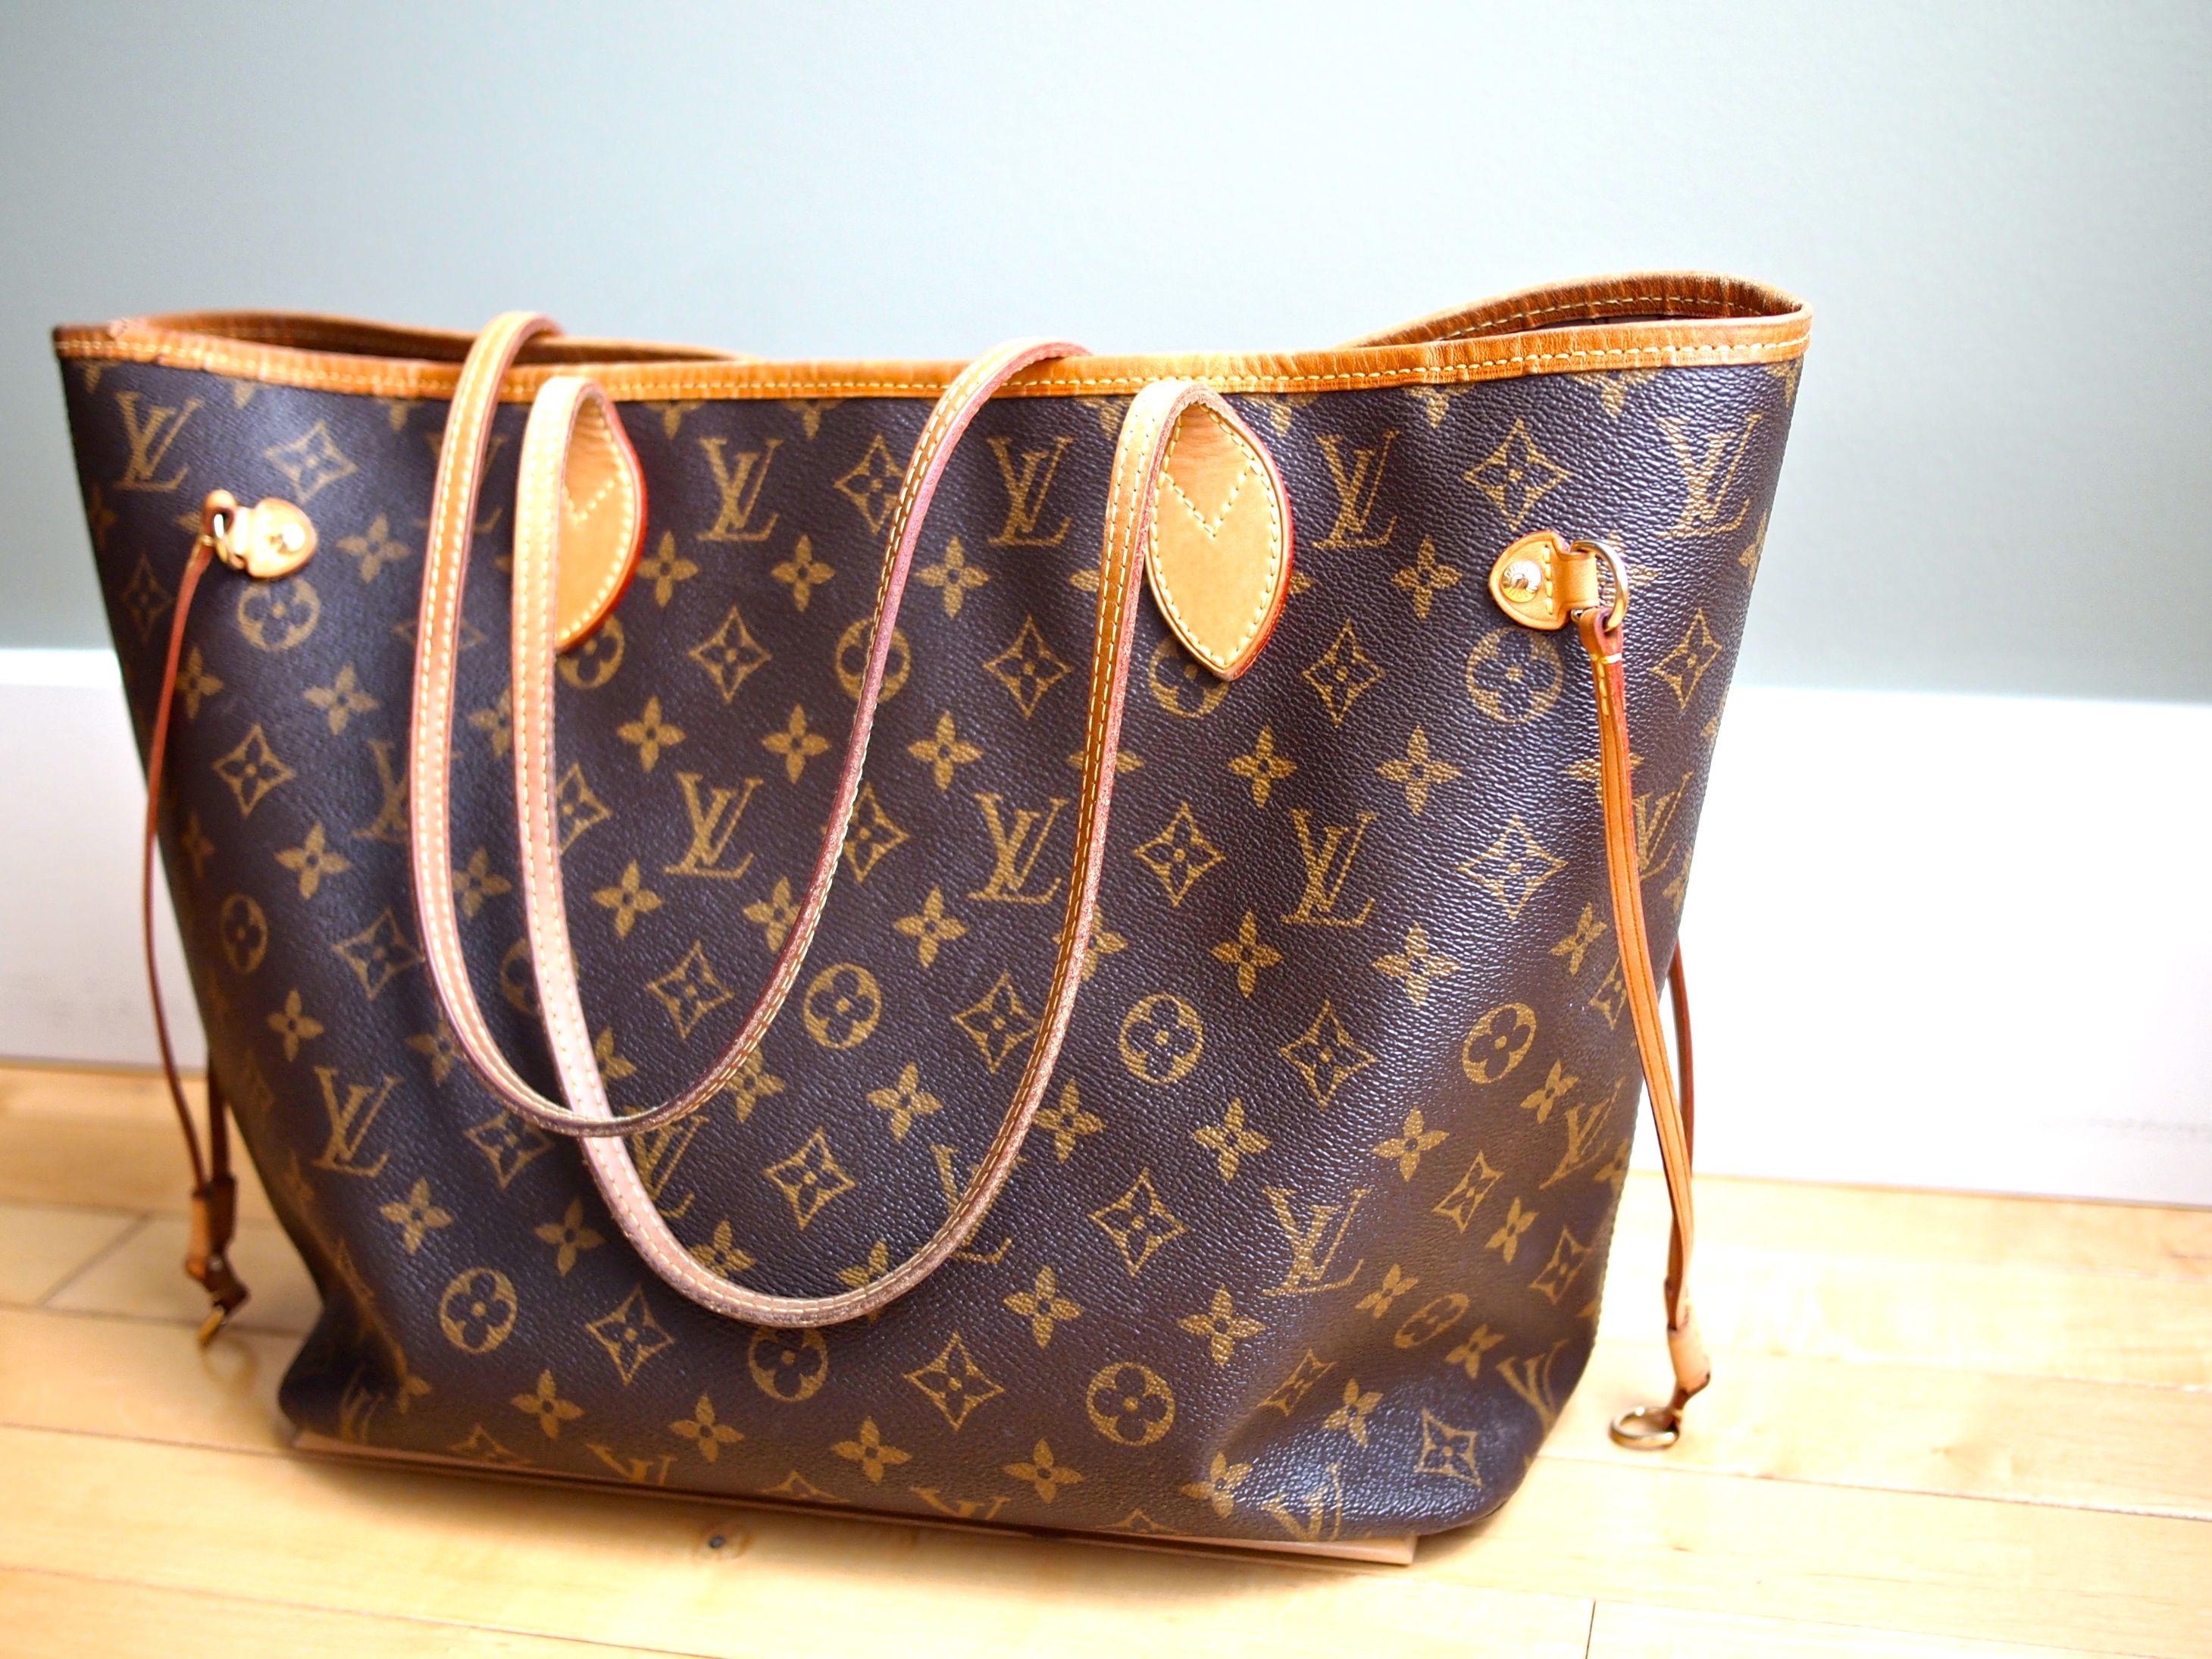 3 Top Louis Vuitton Handbags That You